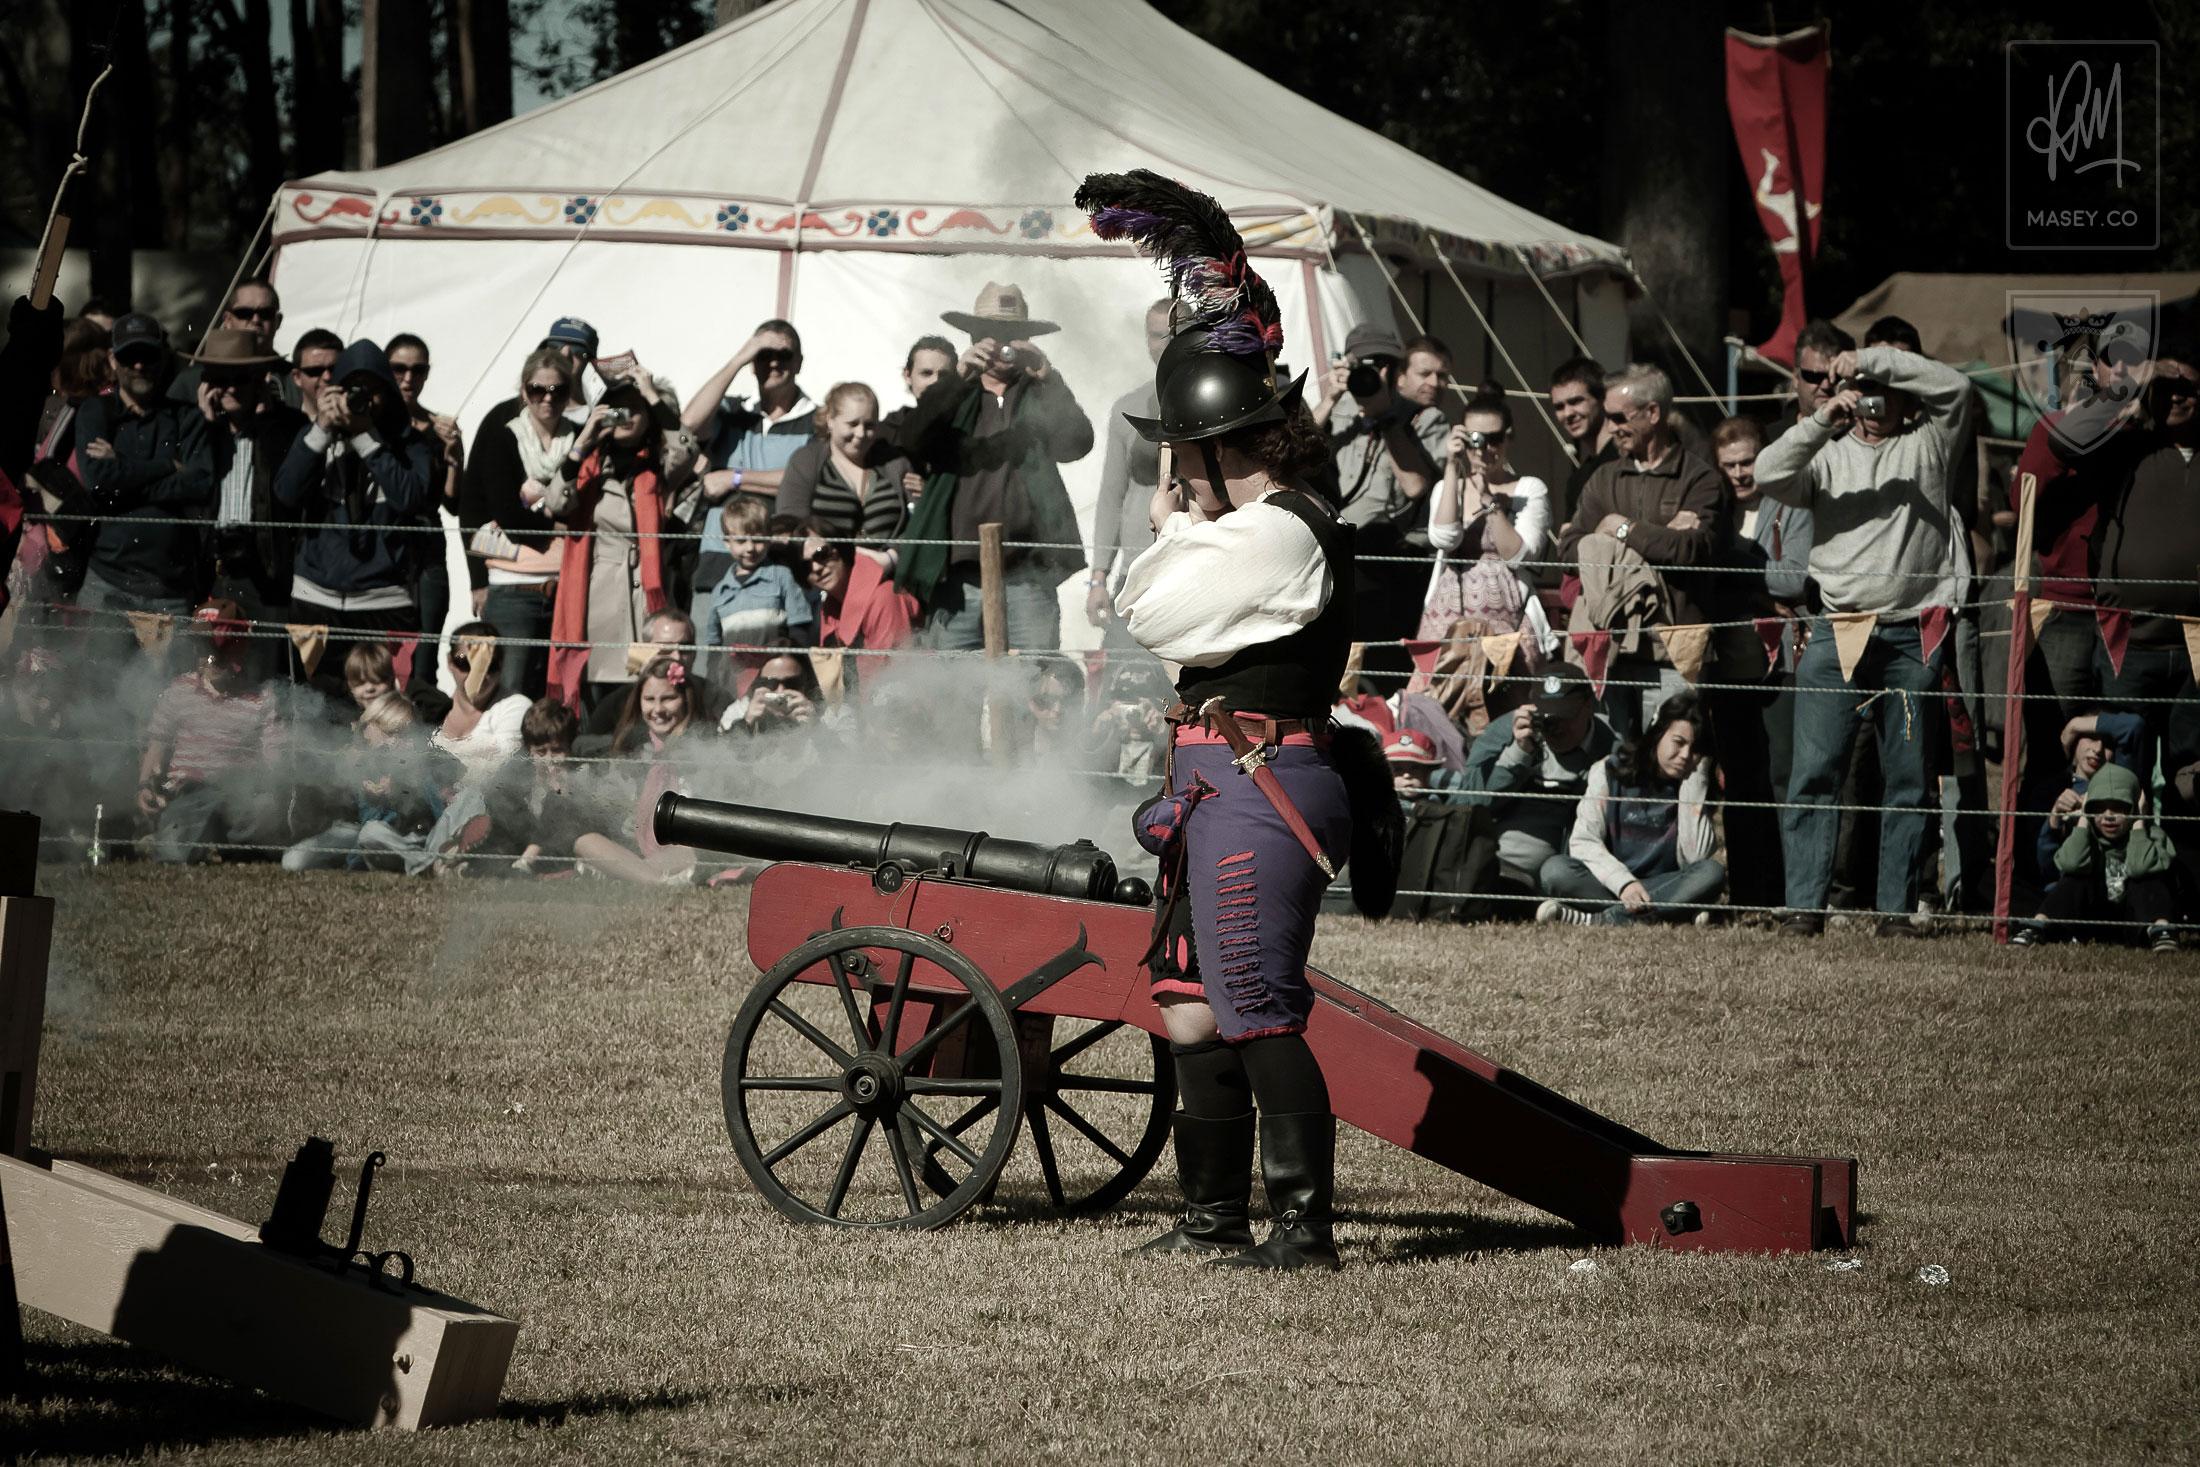 Abbey Medieval Festival 2011